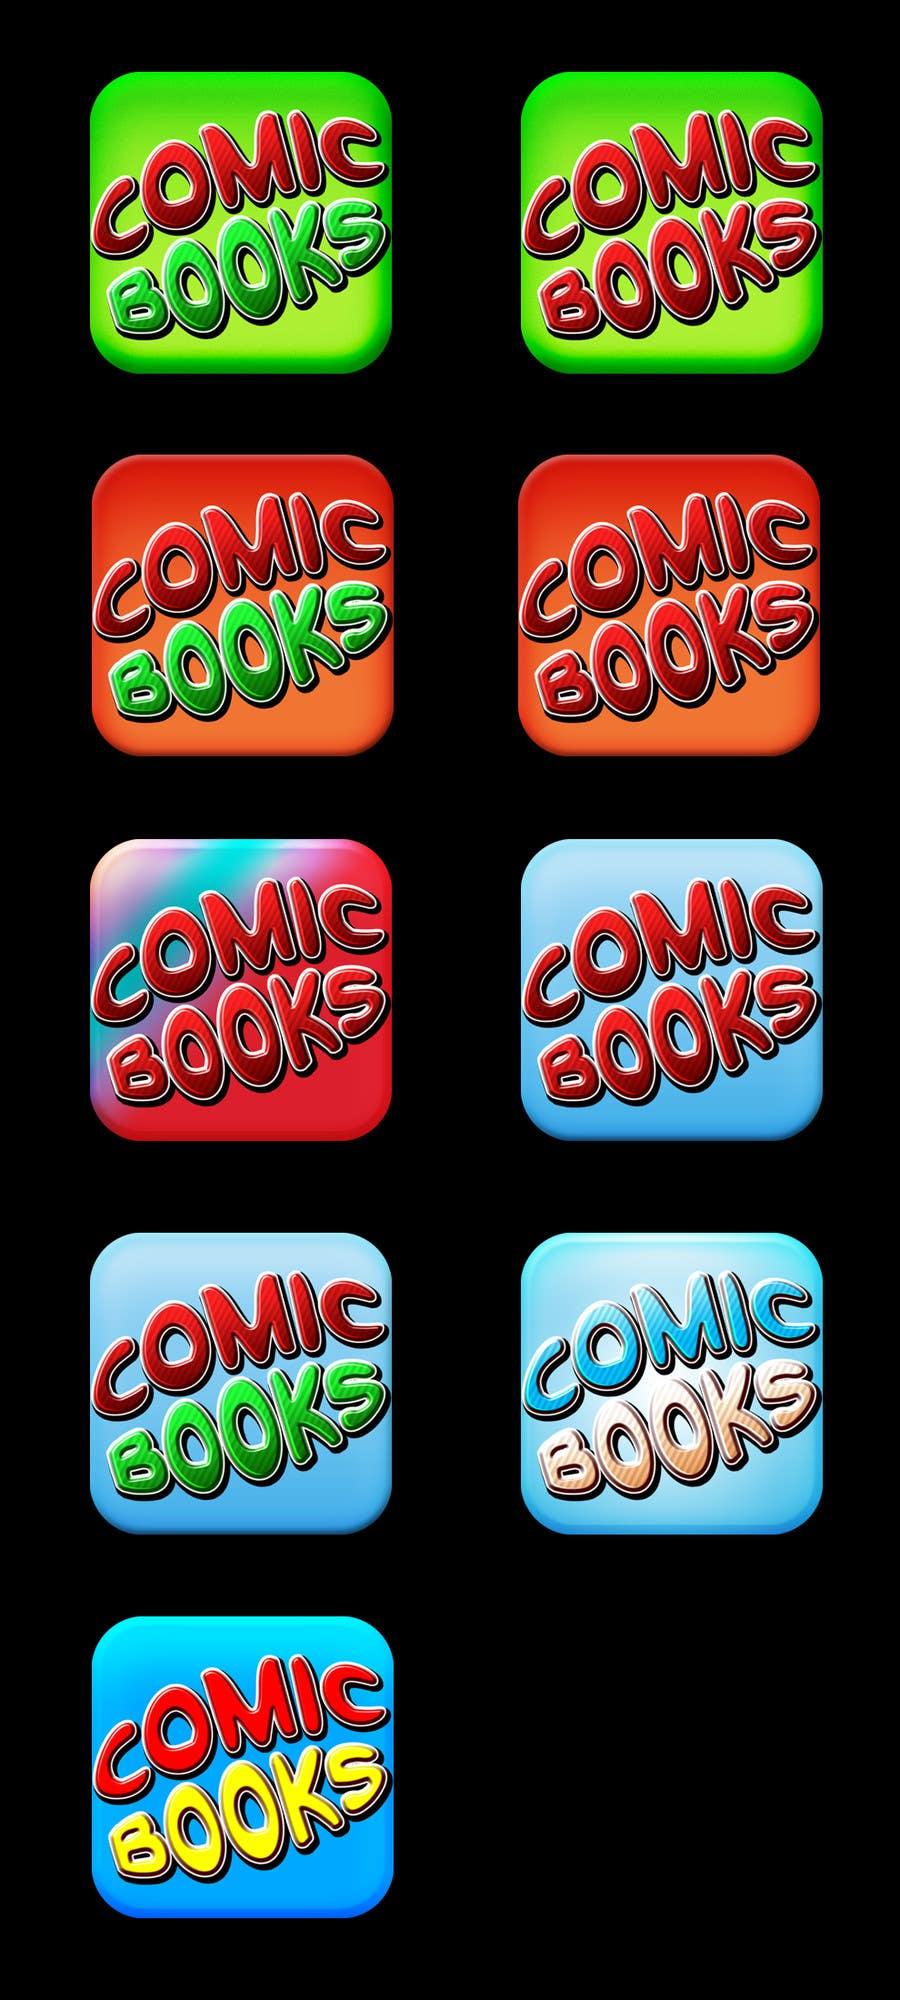 Inscrição nº                                         52                                      do Concurso para                                         Icon or Button Design for iOS comic book icon